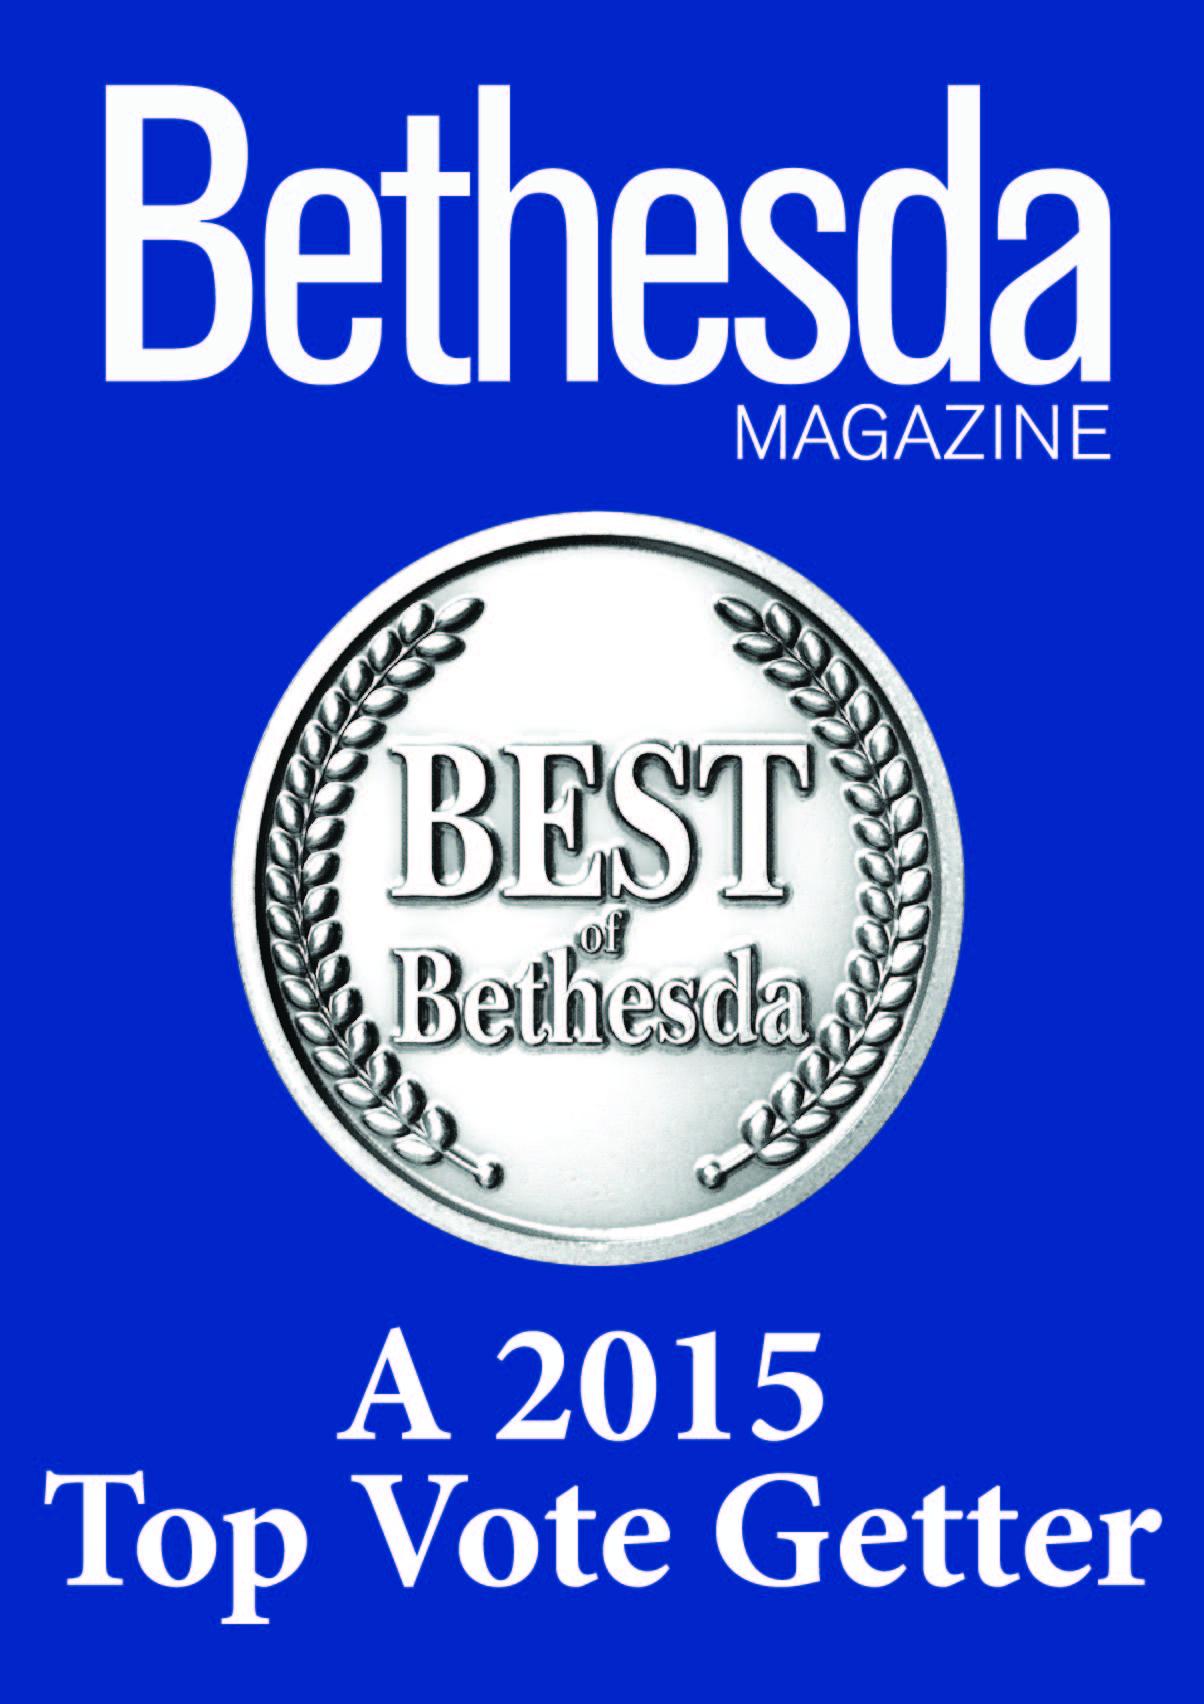 Best of Bethesda 2015 Top Vote Getter